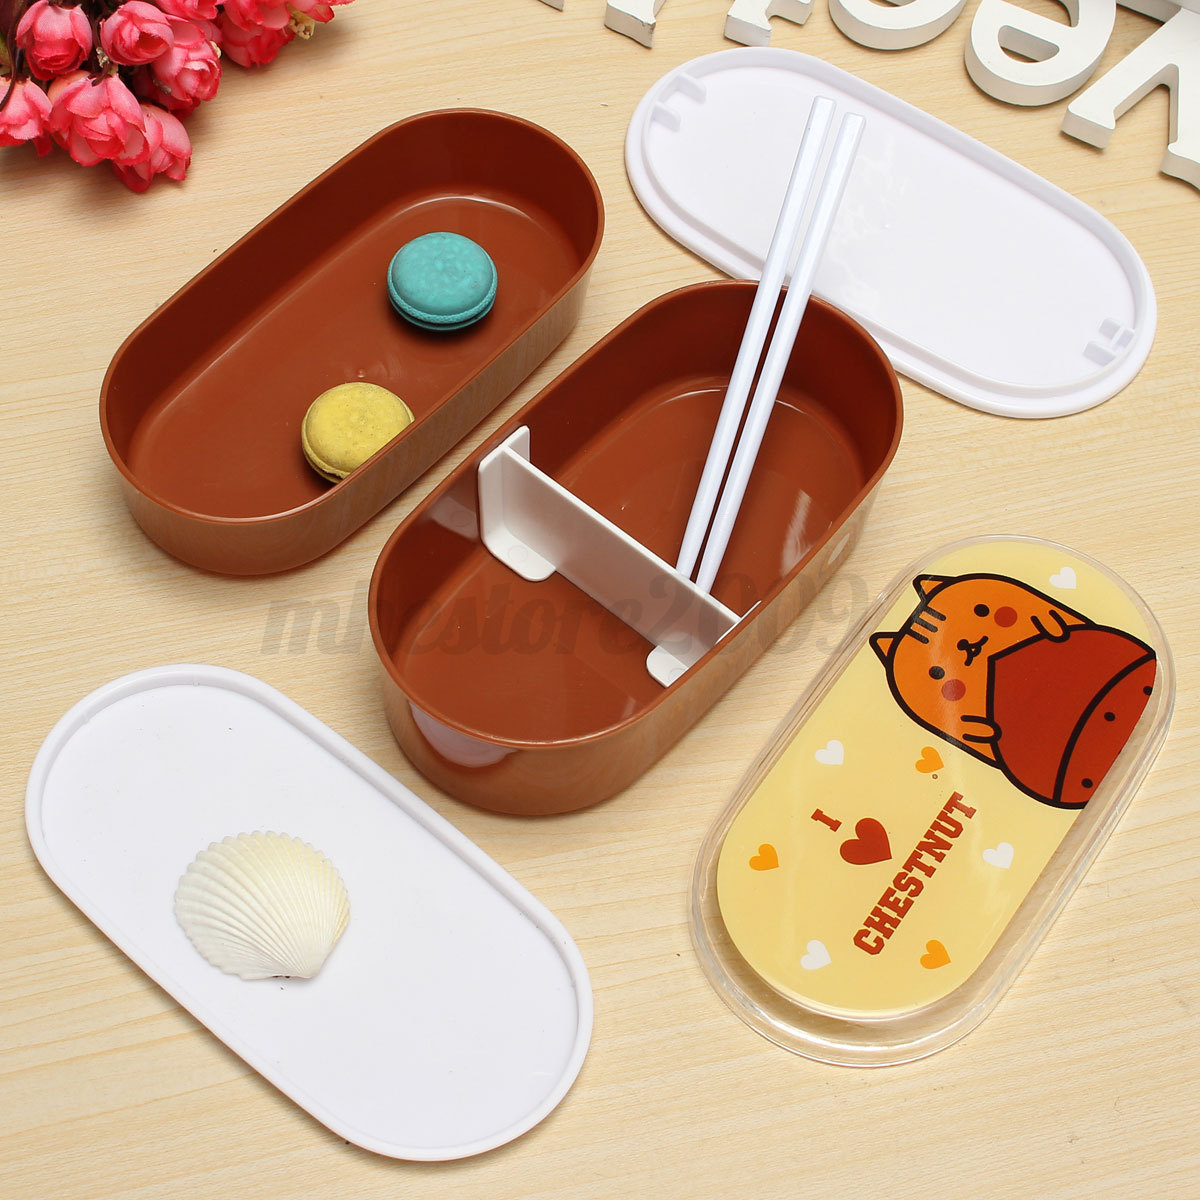 student cartoon lunch box food container storage portable bento box chopsticks ebay. Black Bedroom Furniture Sets. Home Design Ideas